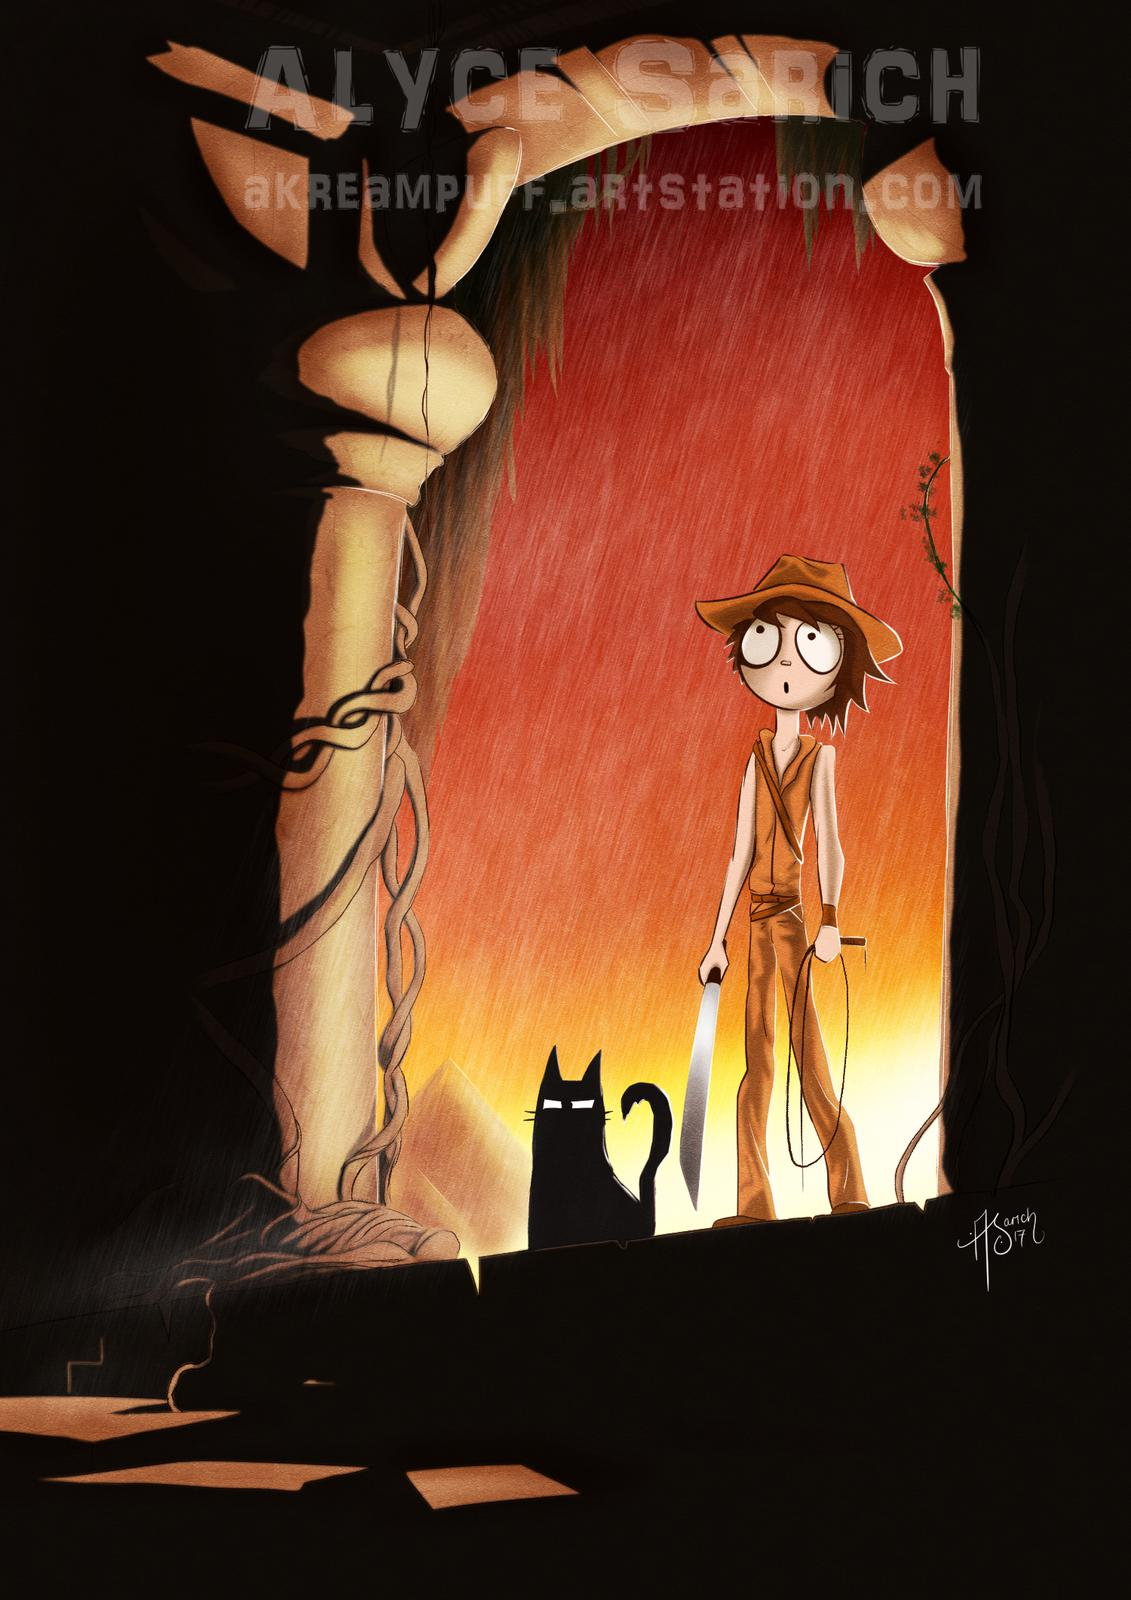 Ally & DK in the Temple of Doom - Parody Print